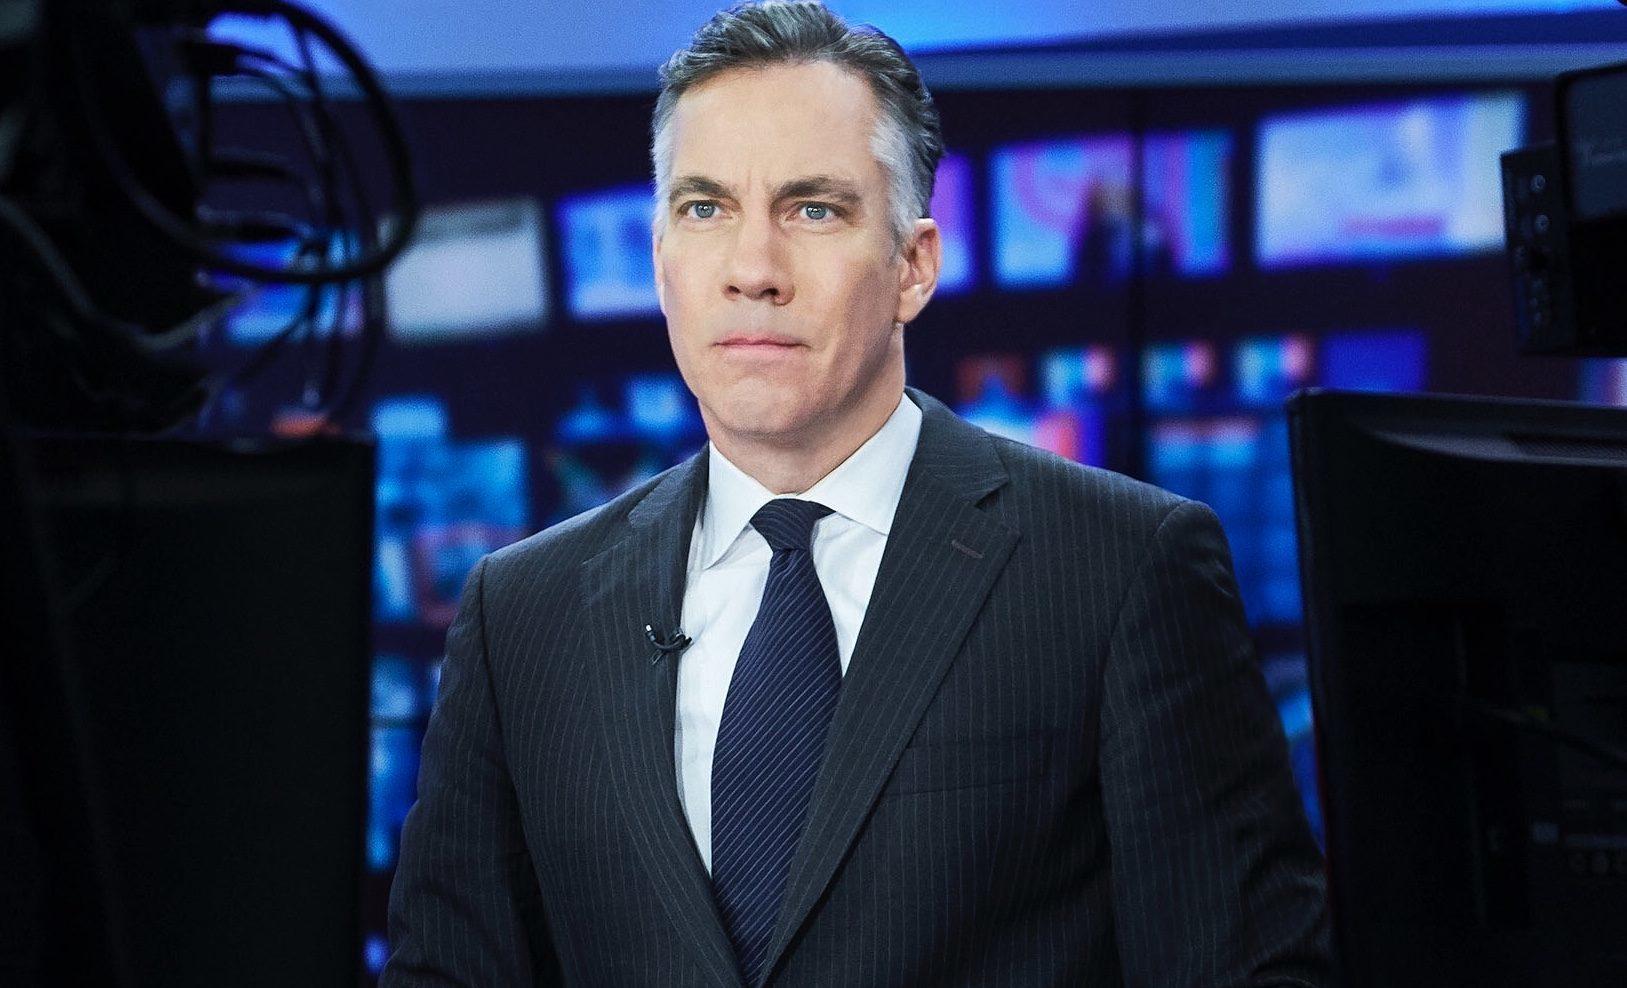 Mediaite Q&A With CNN's Jim Sciutto